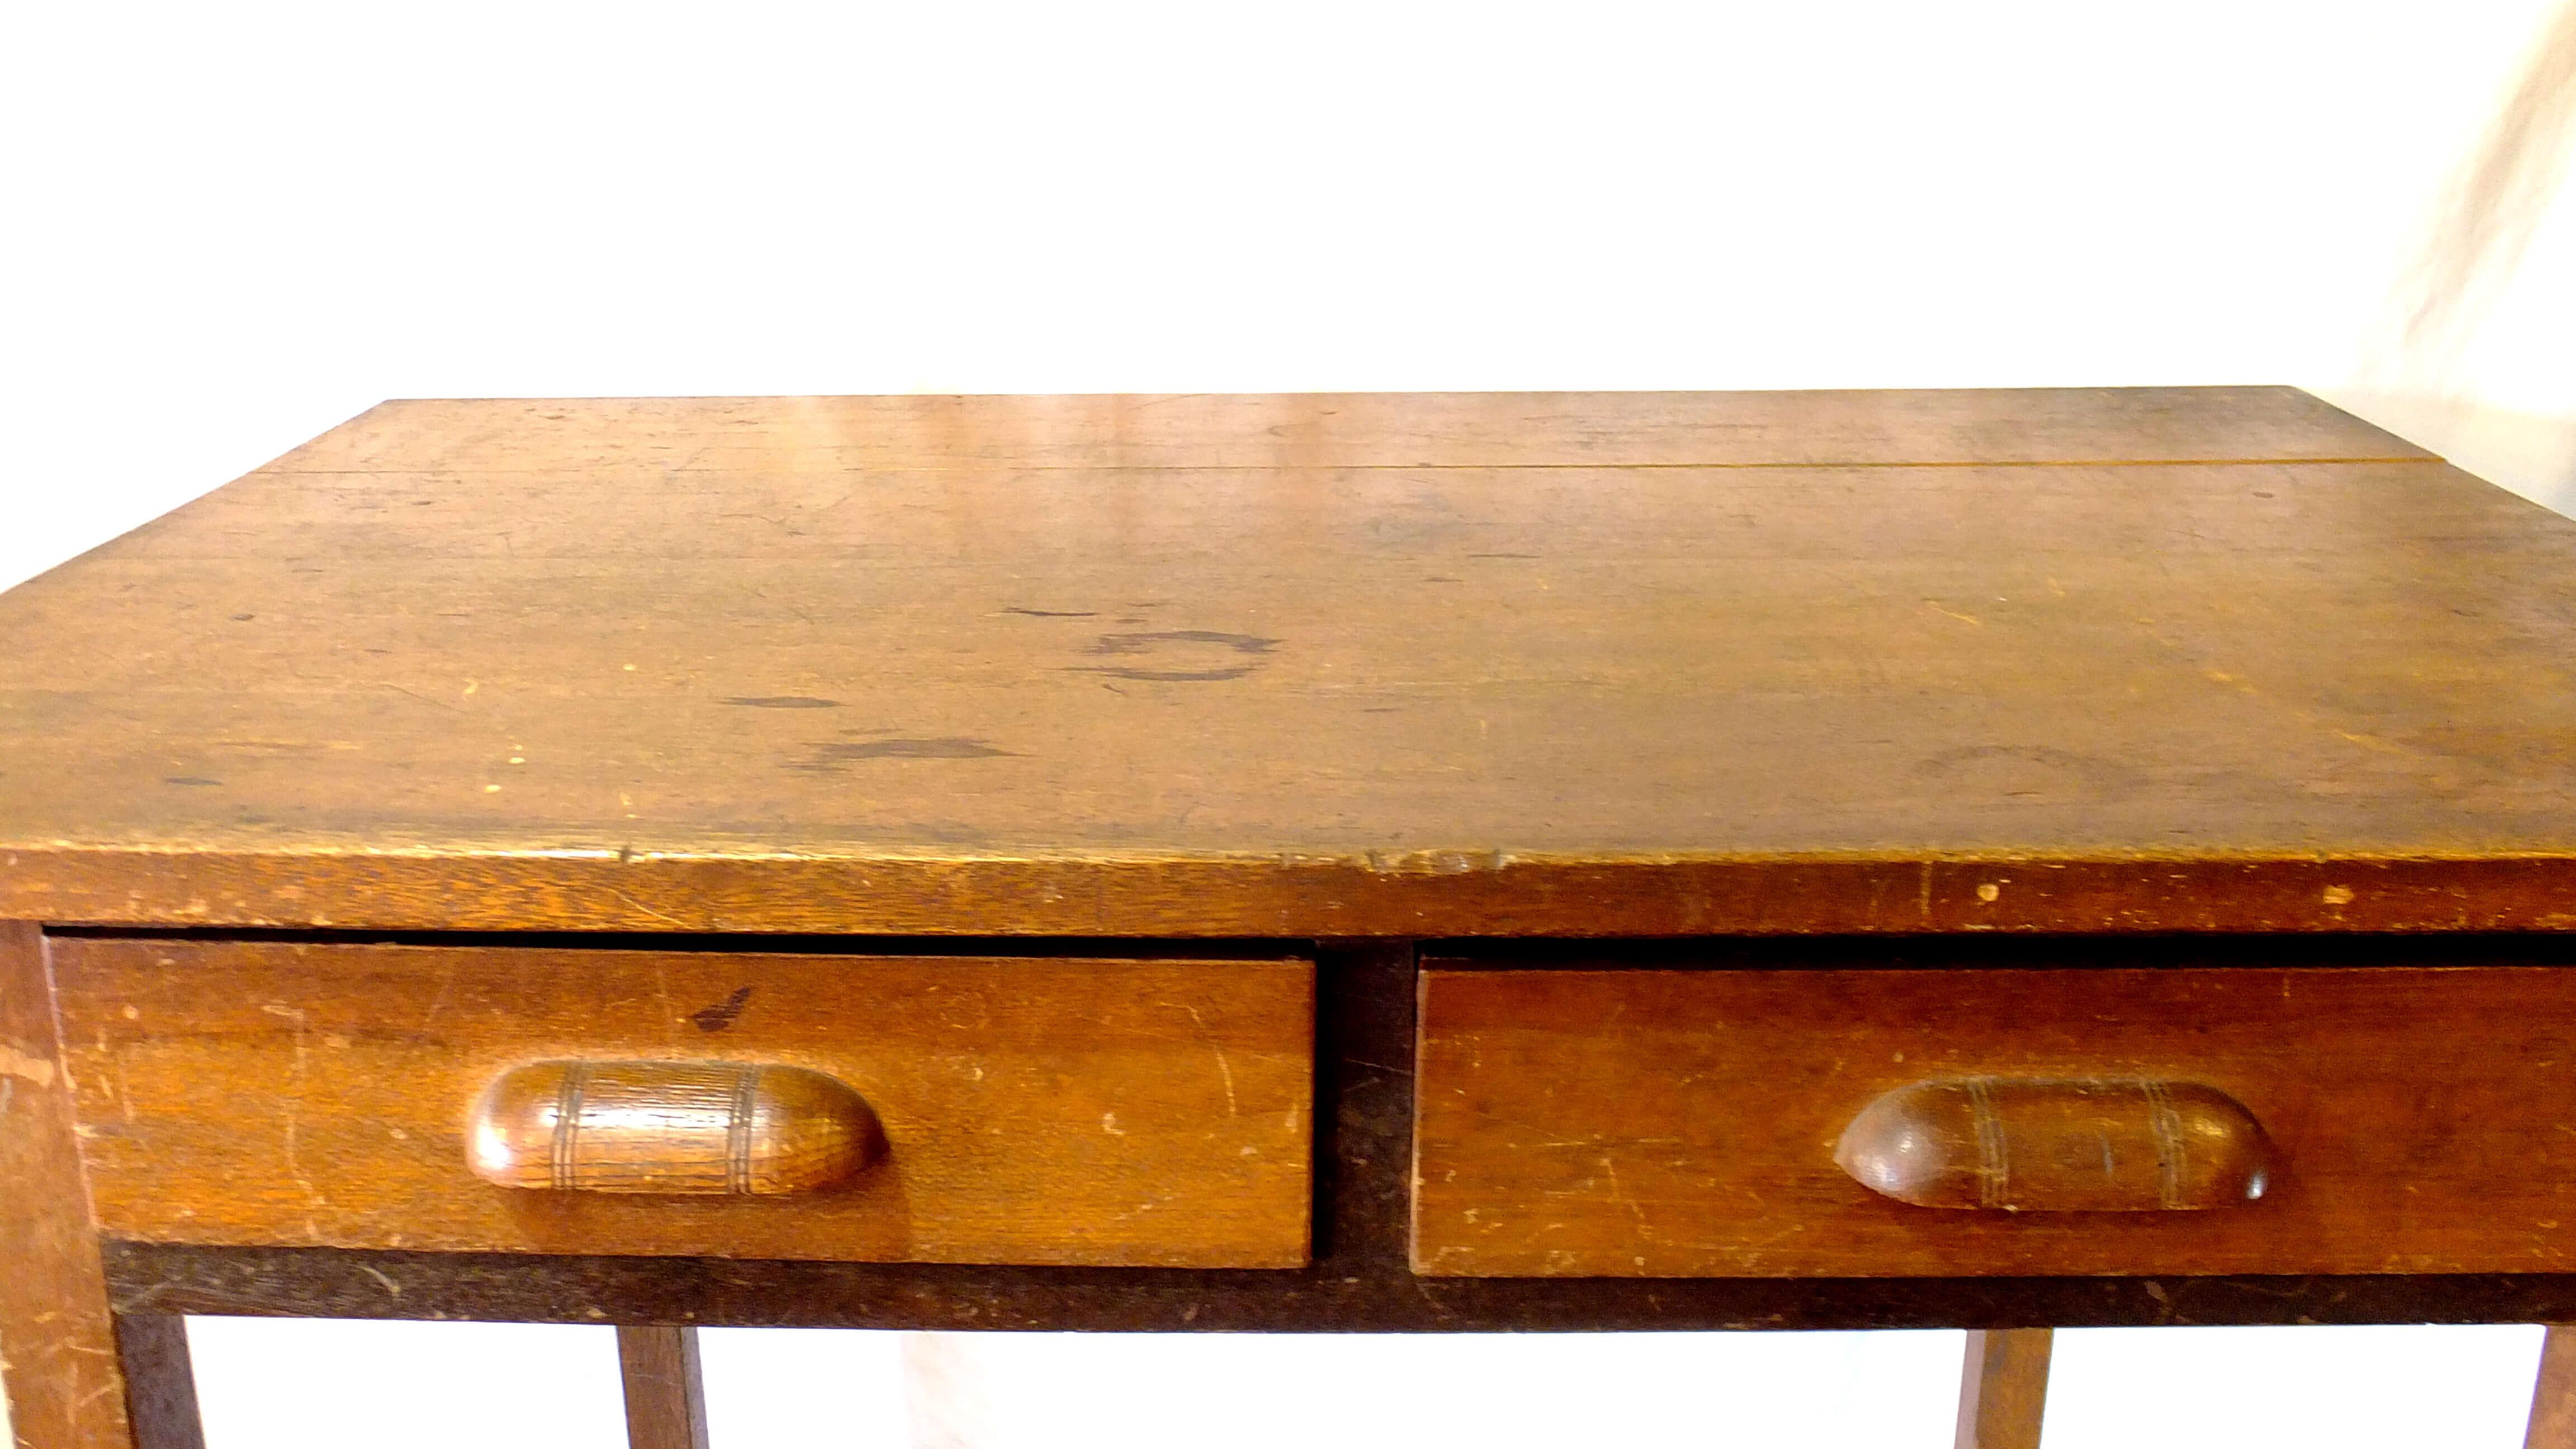 furuichi vintage secondhand japan retro work desk 日本の古い作業